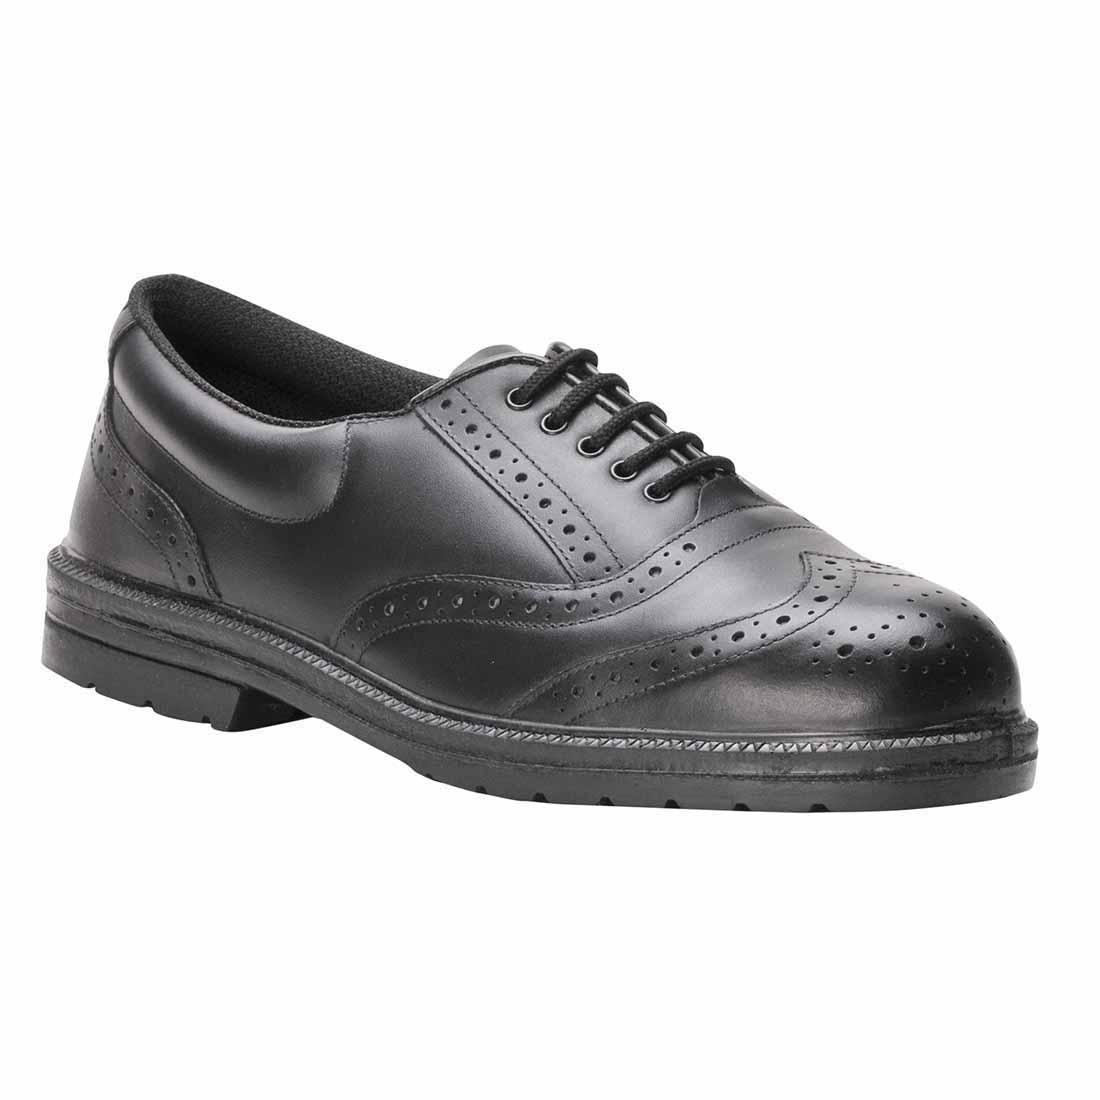 SUw - Steelite Executive Workwear Safety Safety Workwear Brogue Schuhe S1P 209ebd